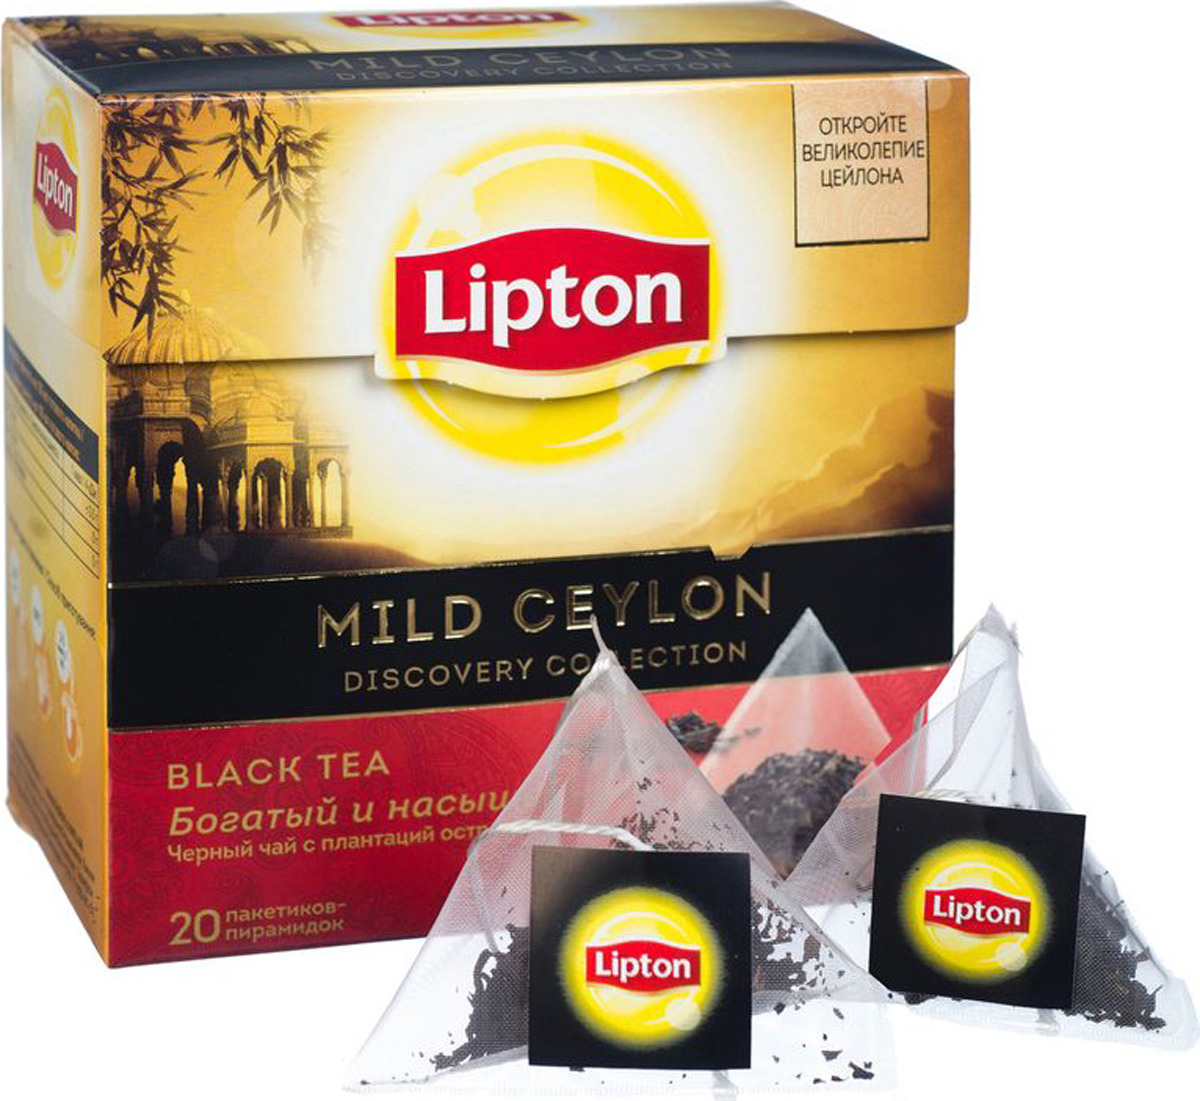 Lipton Черный чай Mild Ceylon 20 шт lipton черный чай heart of ceylon 100 шт